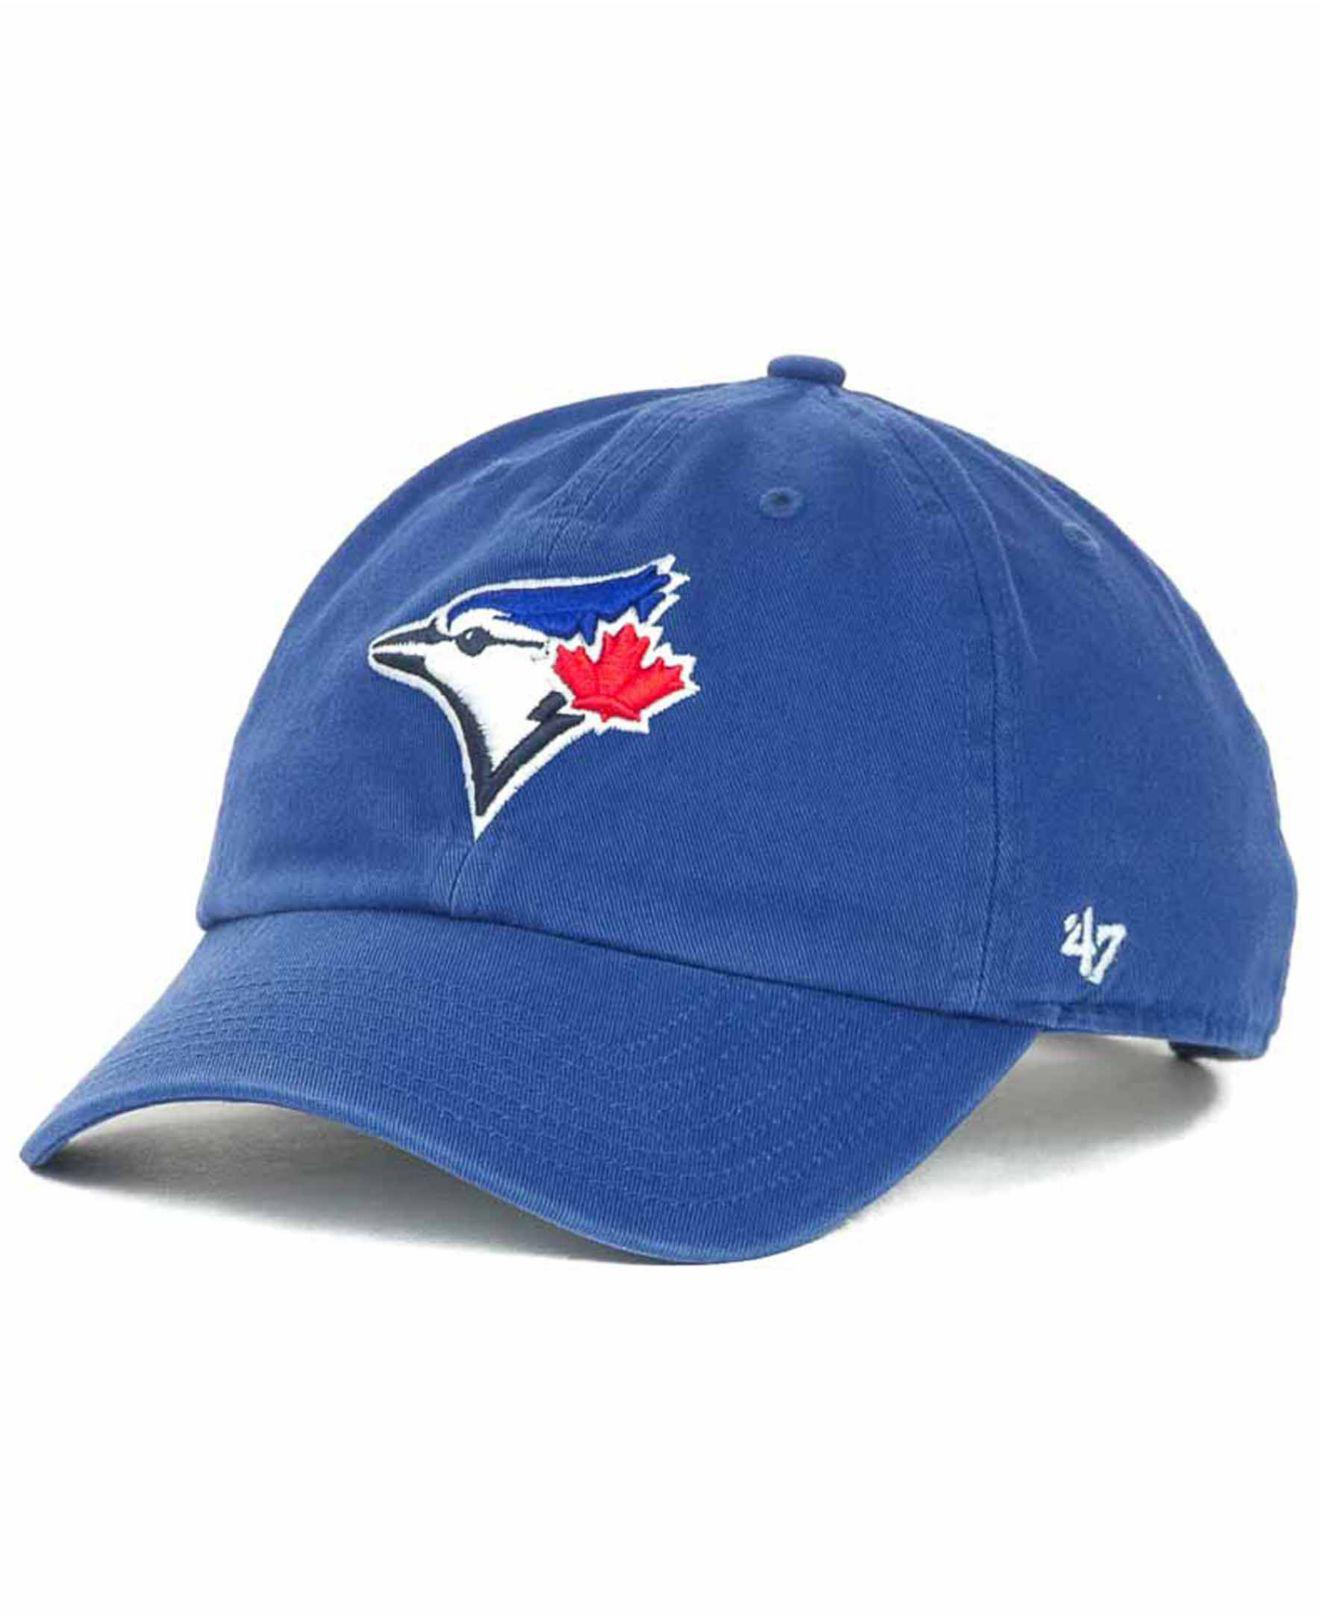 uk availability 23265 deeee 47 Brand. Men s Toronto Blue Jays Clean Up Hat